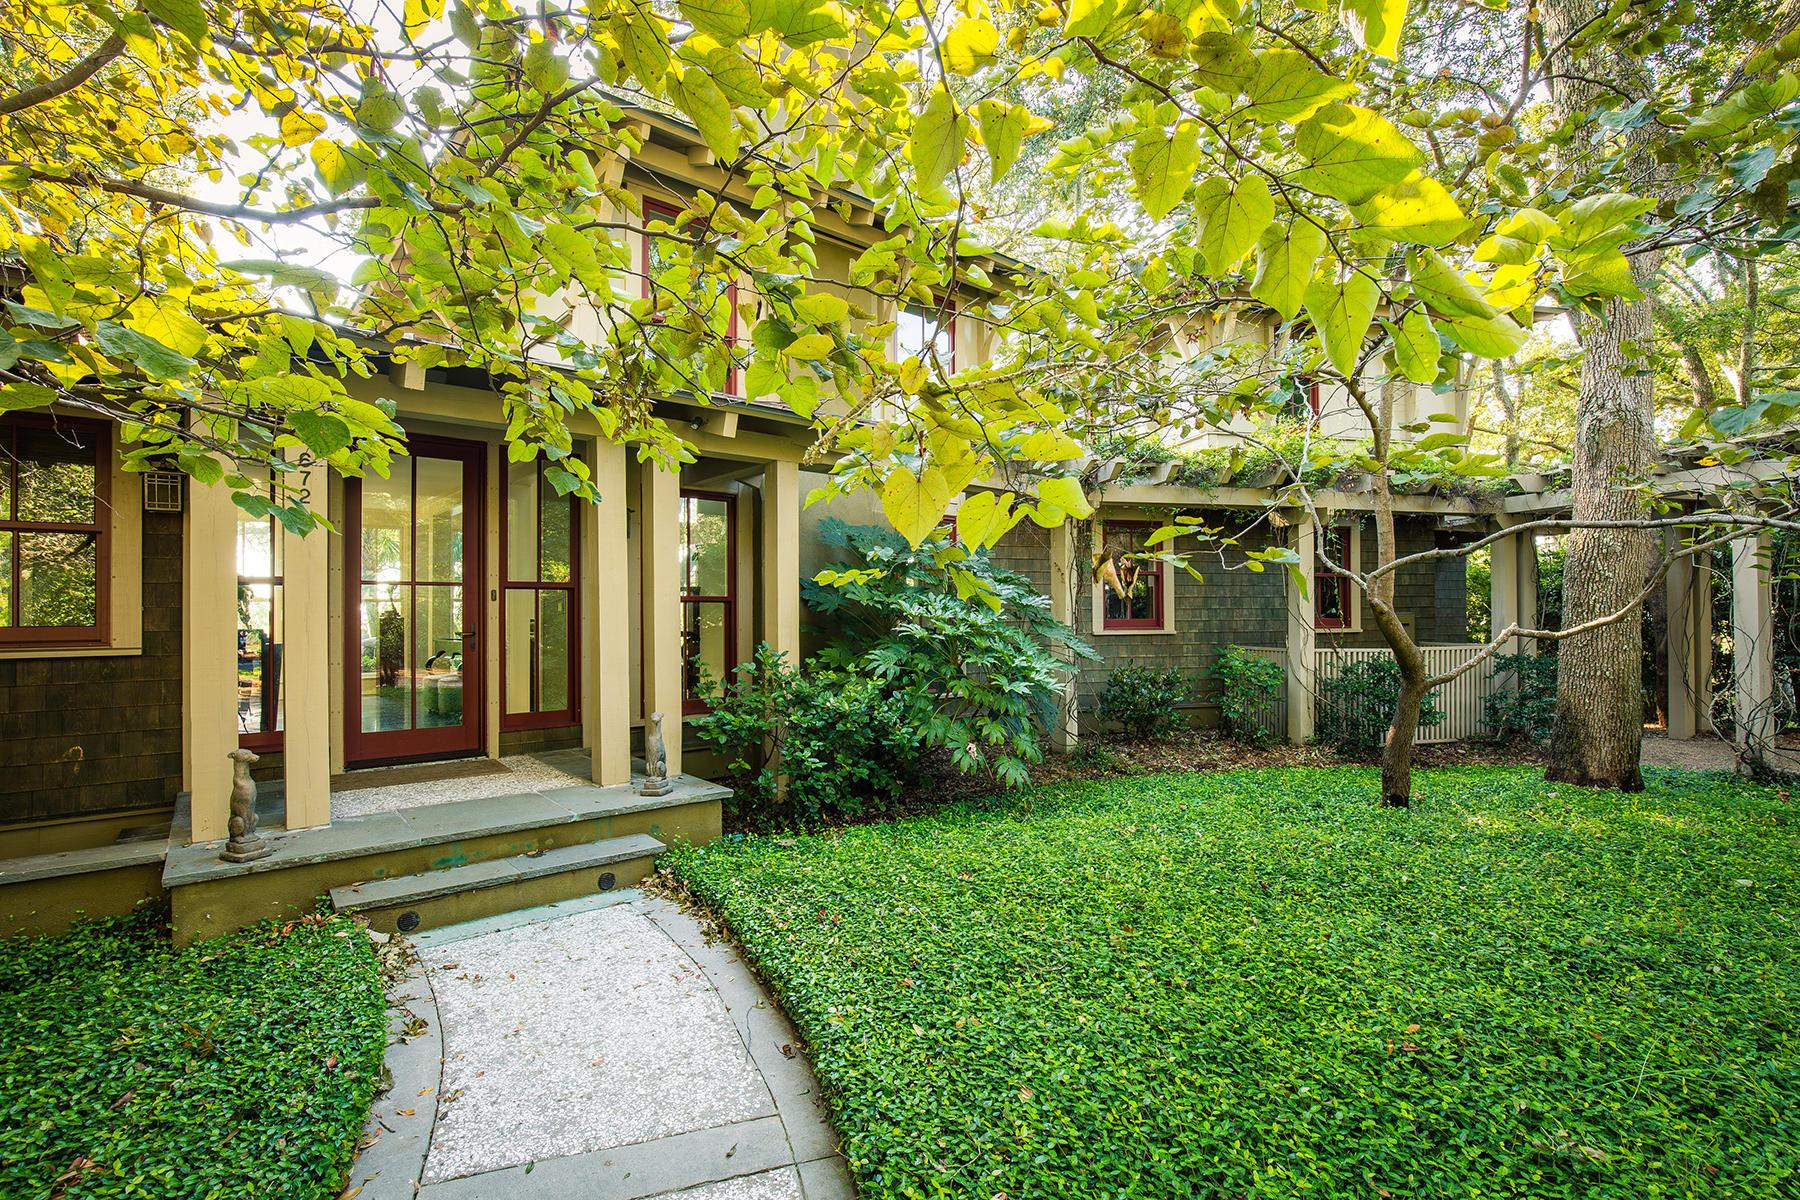 Ellis Oaks Homes For Sale - 672 Ellis Oak, Charleston, SC - 2